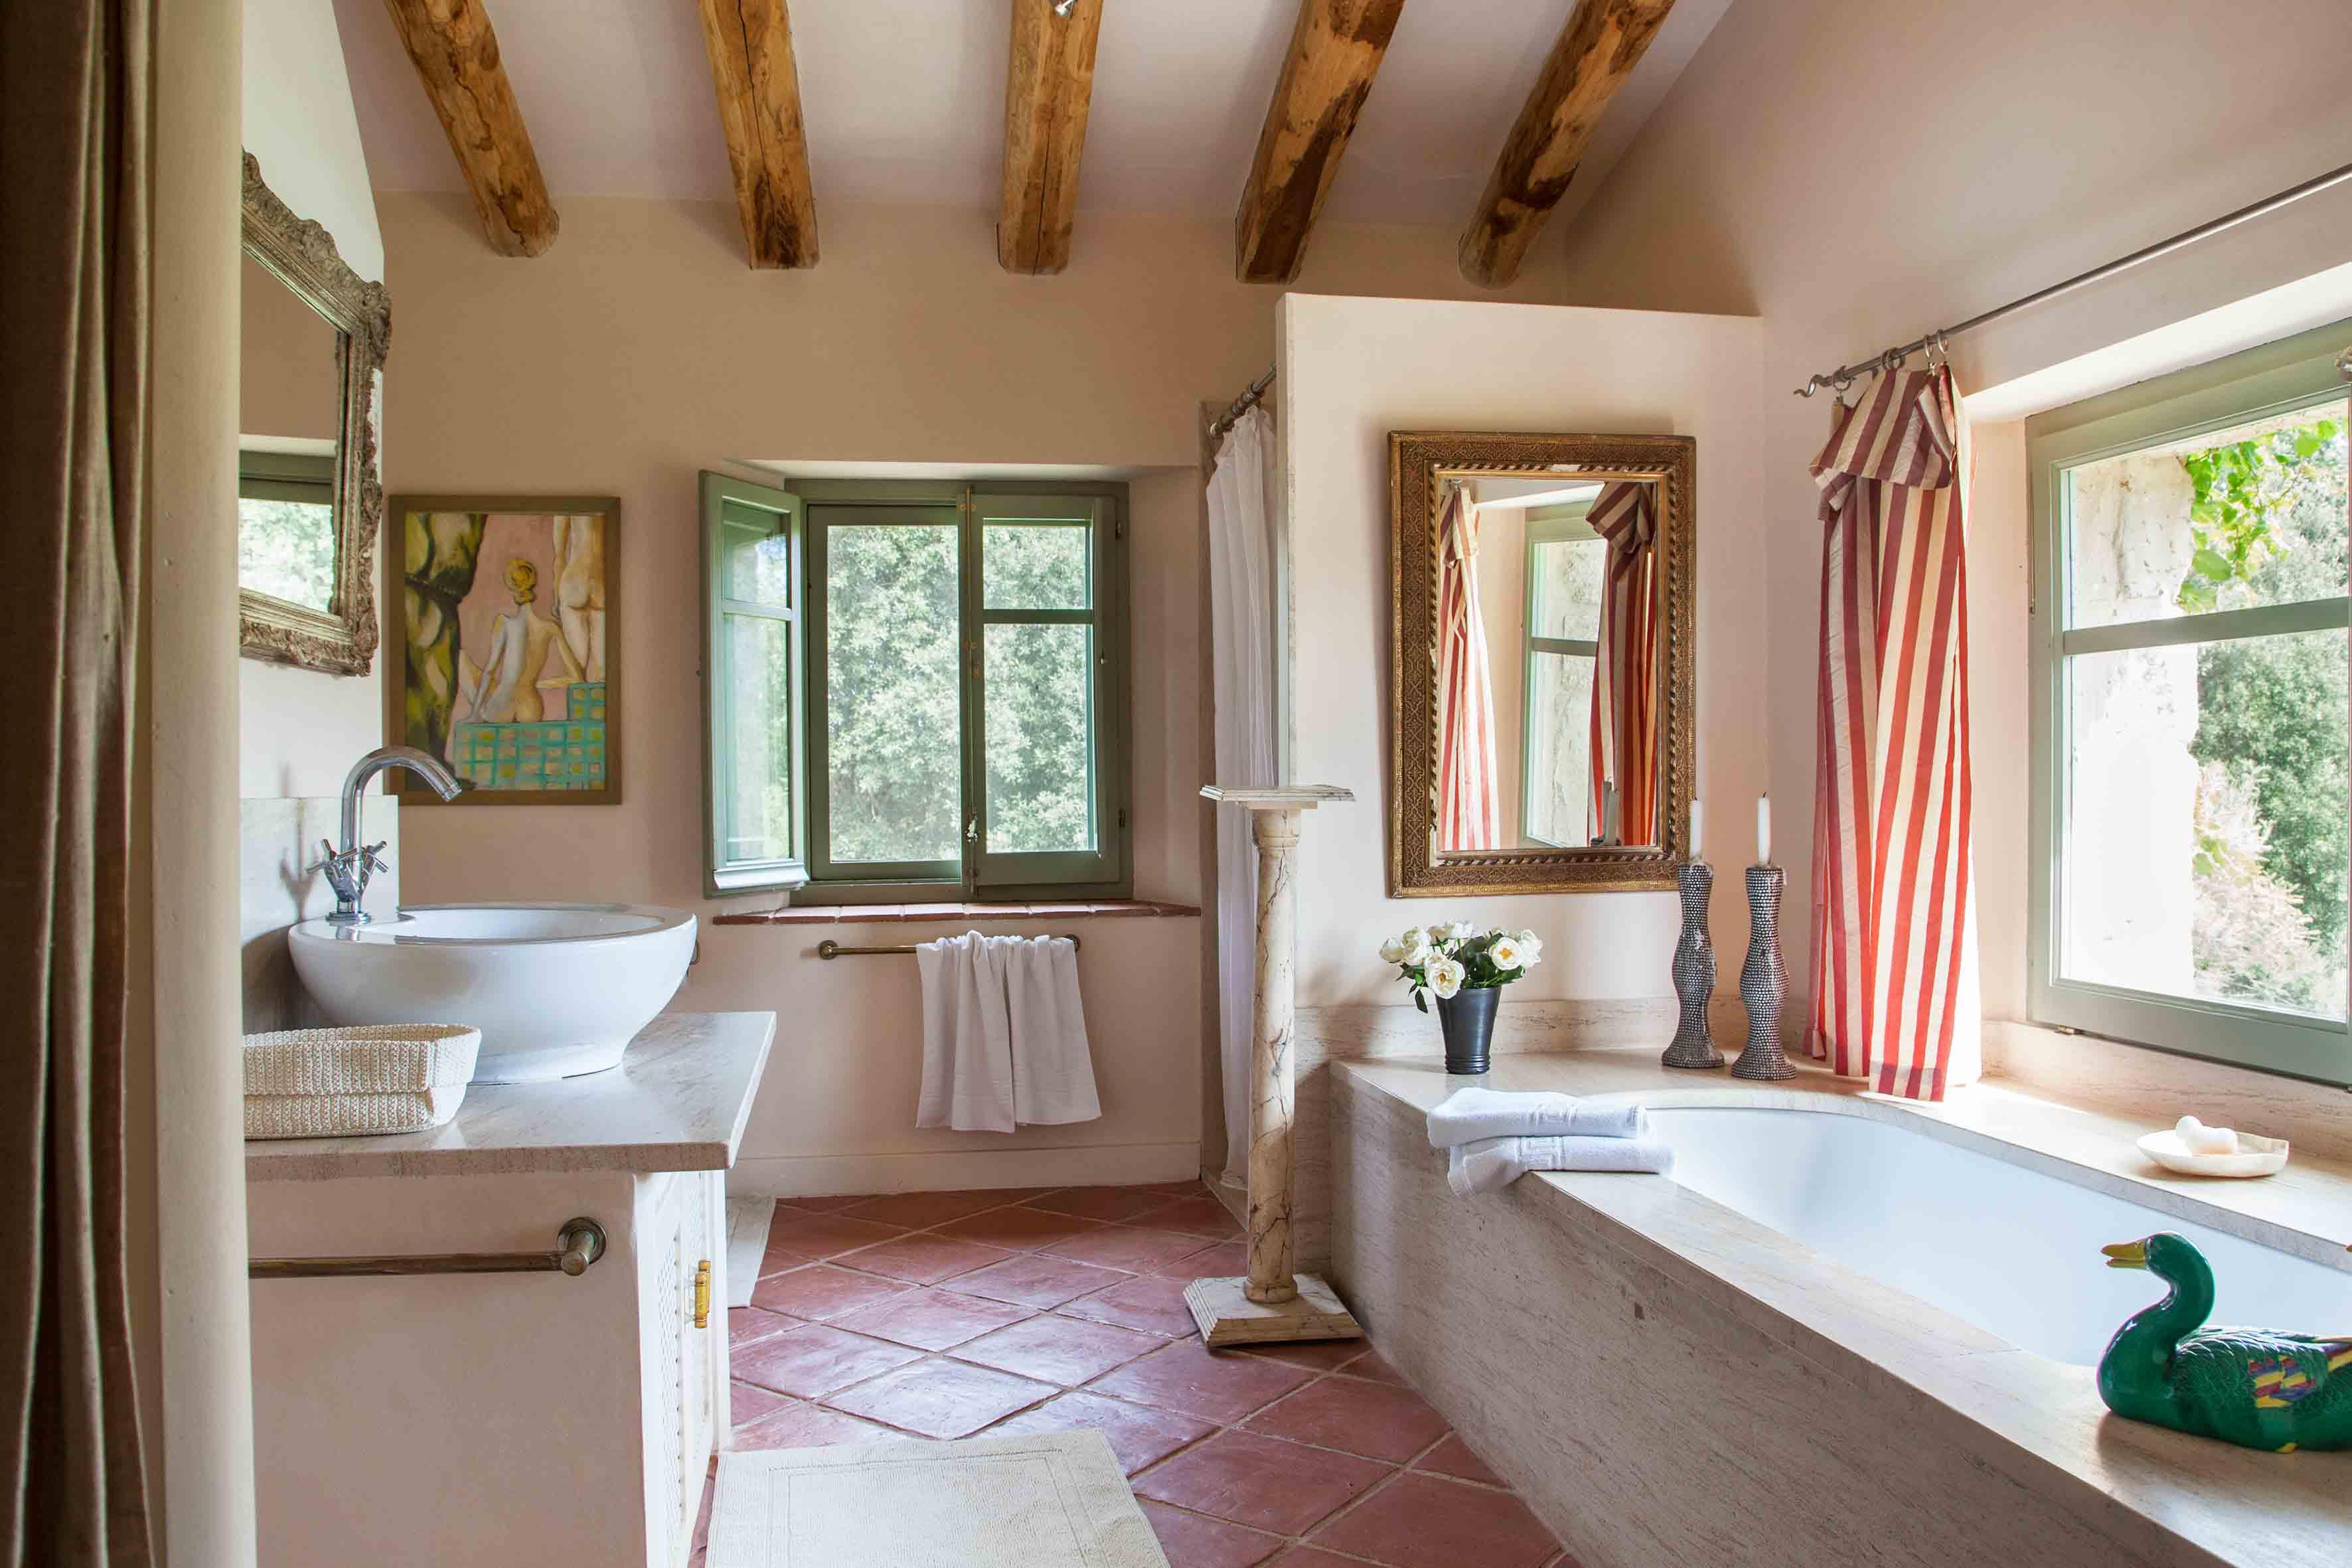 Maria pujol casa campo la mas a del caballero - Casas de campo restauradas ...